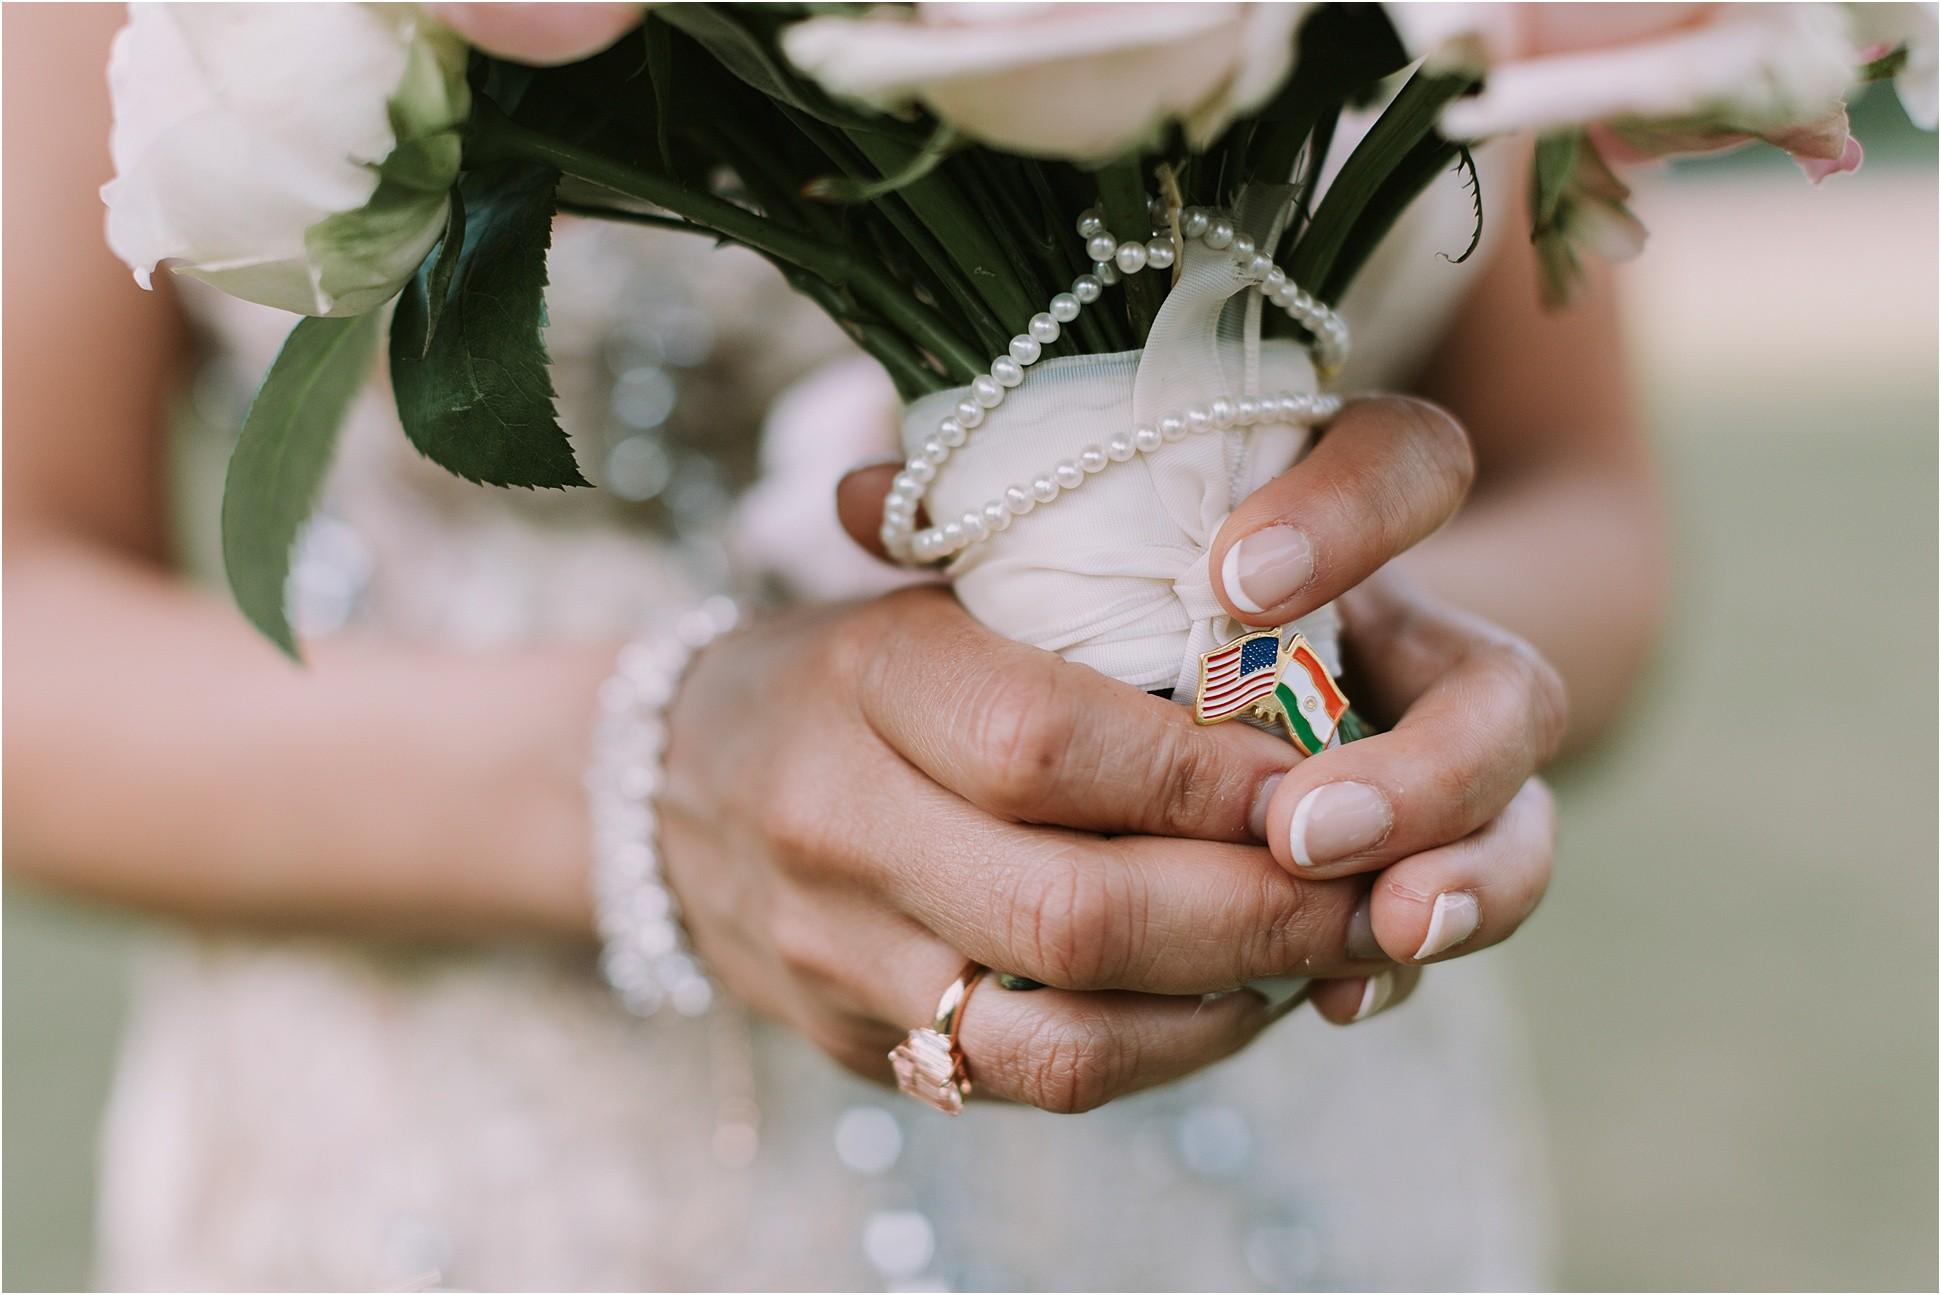 Kateryna-photos-photographe-mariage-chateau-st-paterne-mayenne-normandie_0164.jpg